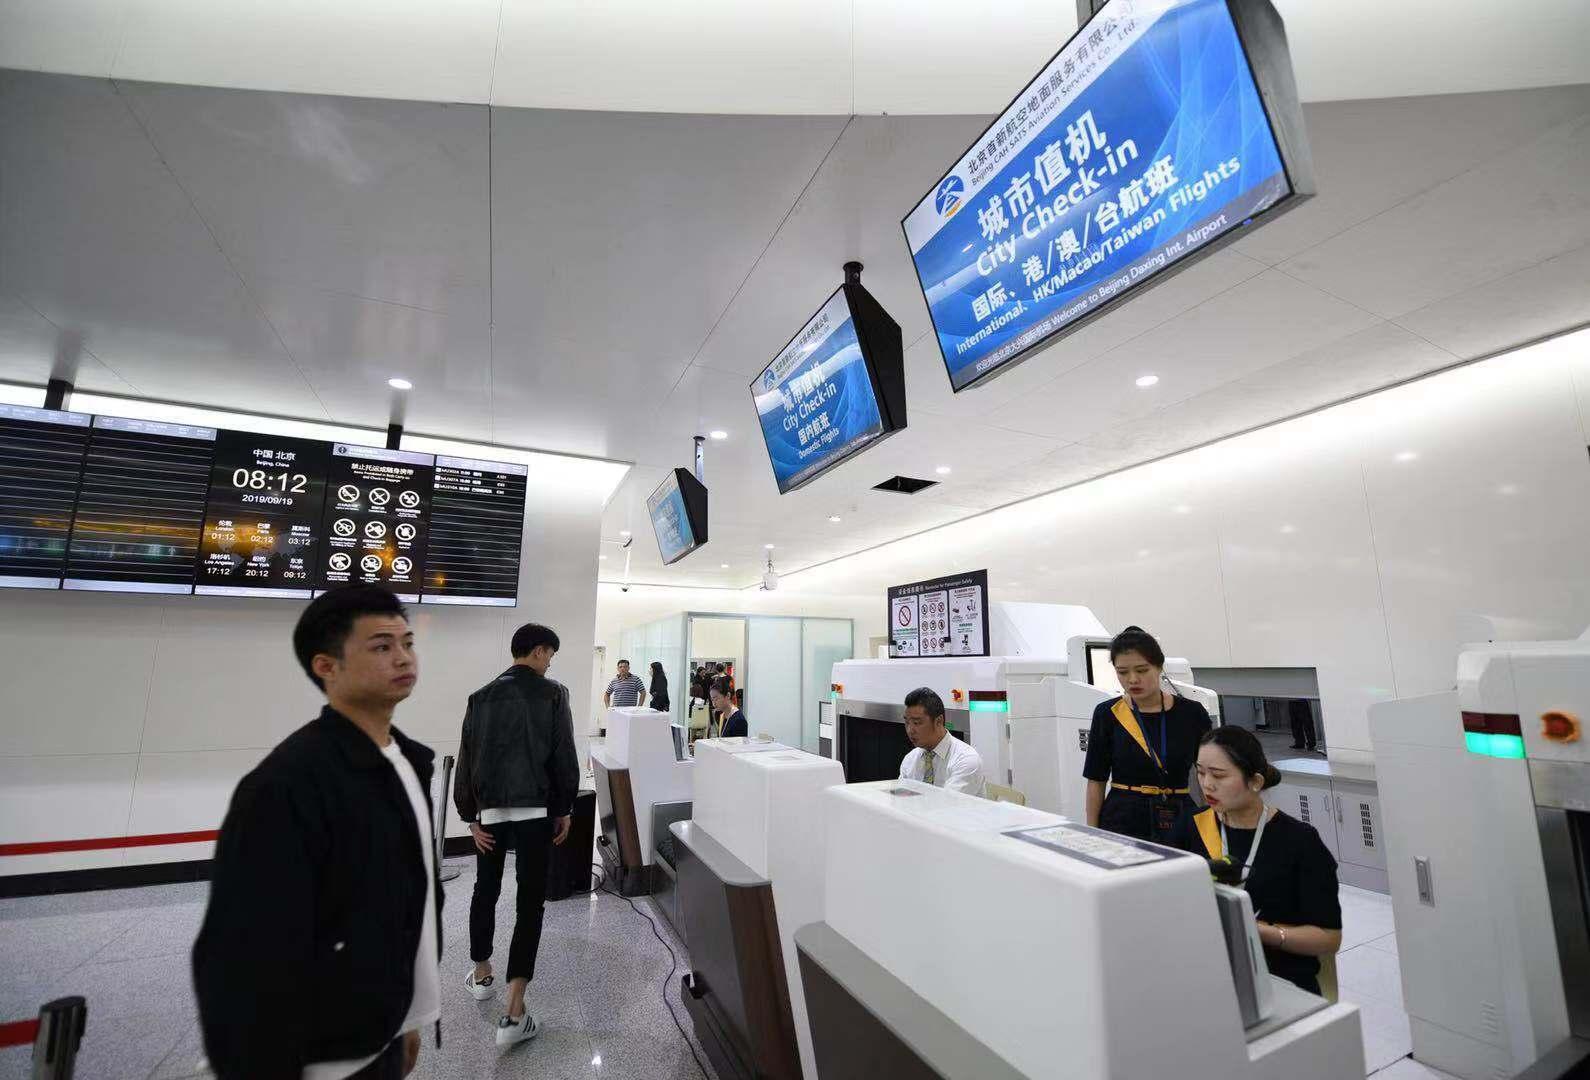 <b>北京大兴国际机场空轨联运上线,地铁票可享八折优惠</b>